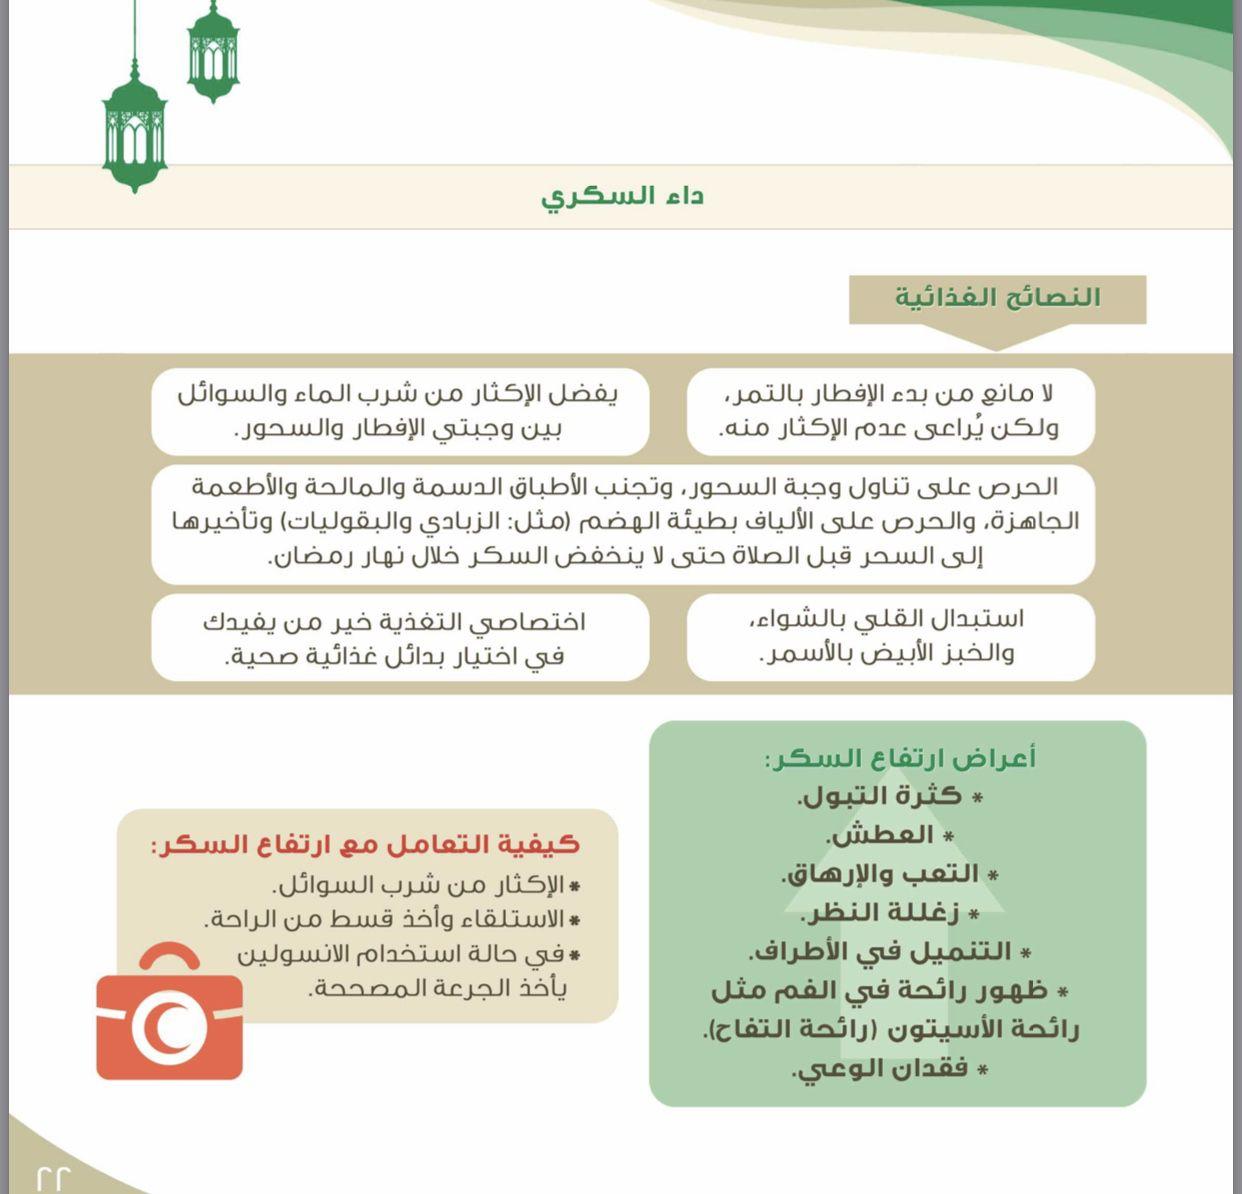 Pin By Re0o0ry ه م س ات ع اب ر ة On Diabetes السكري Slc Ios Messenger